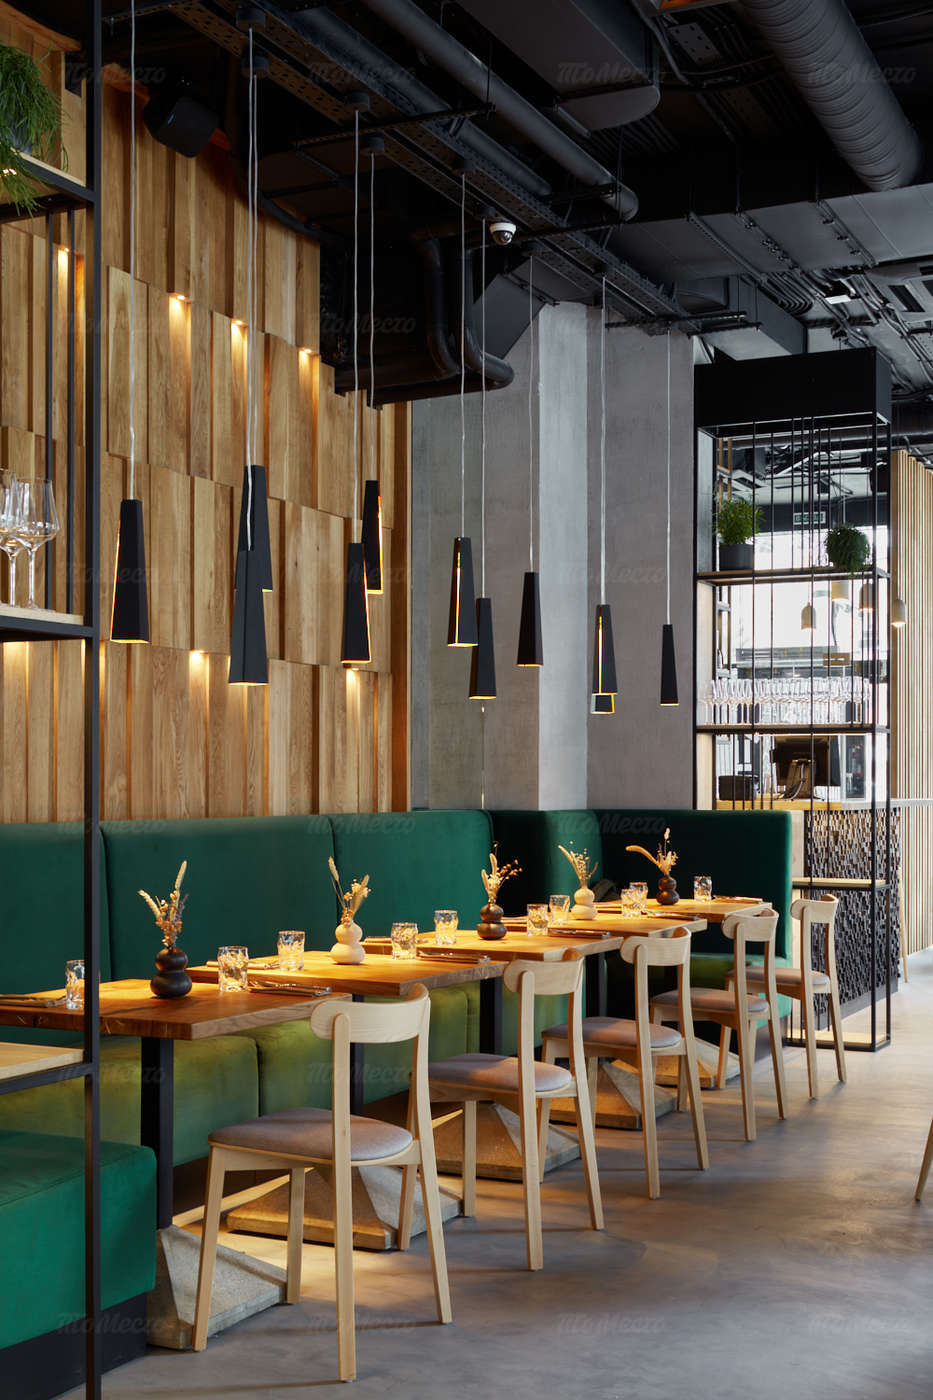 Ресторан Asia Inn (Азиа Инн) на бульваре Генерала Карбышева фото 5